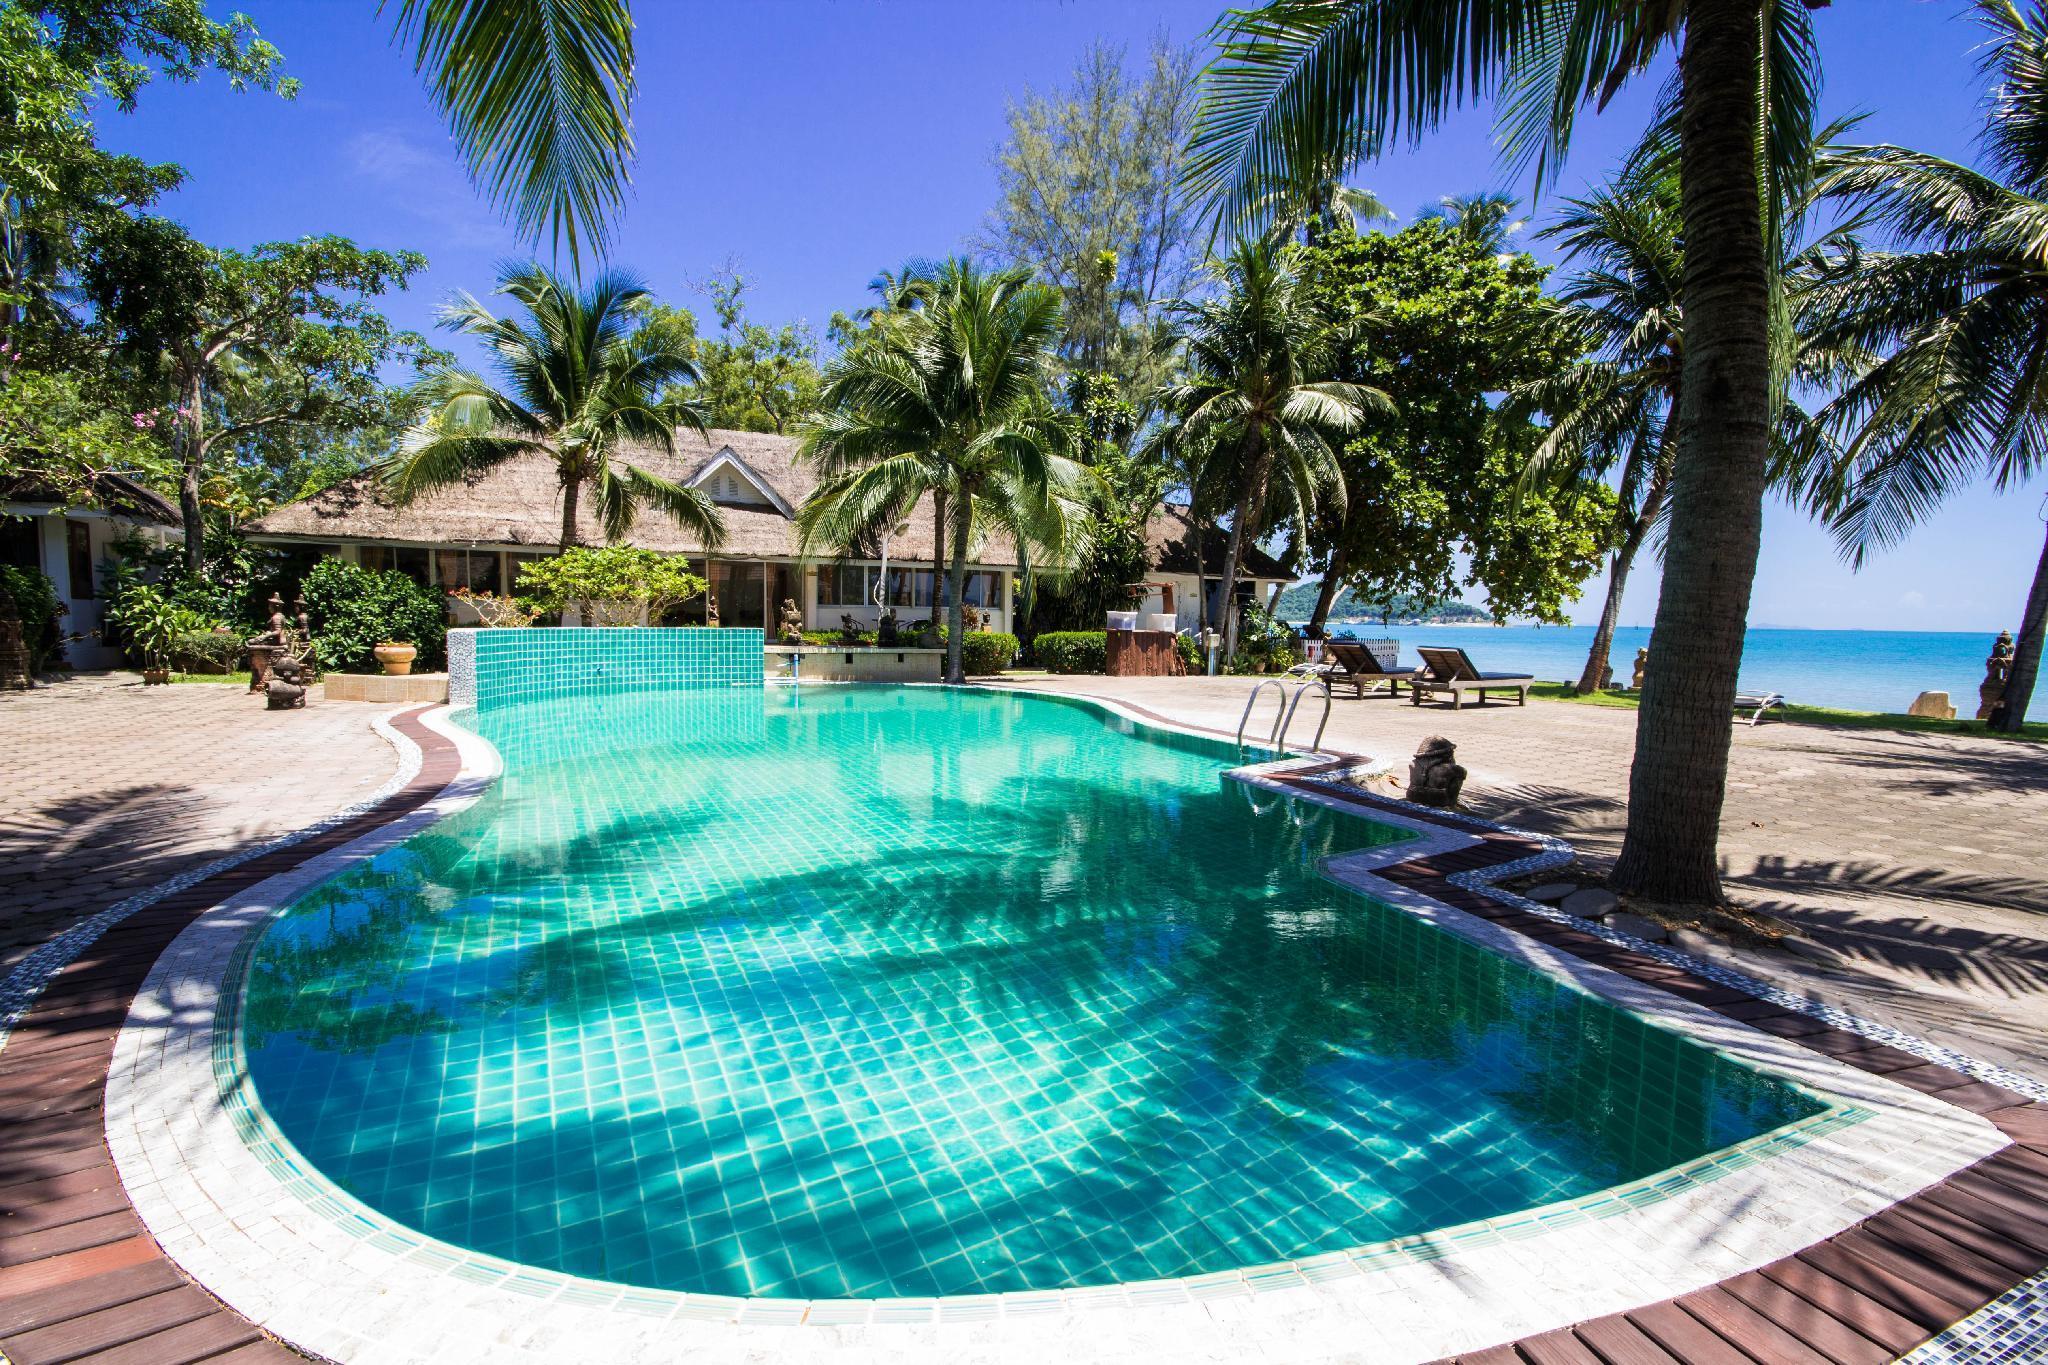 Rajapruek Samui Resort ราชพฤกษ์ สมุย รีสอร์ท